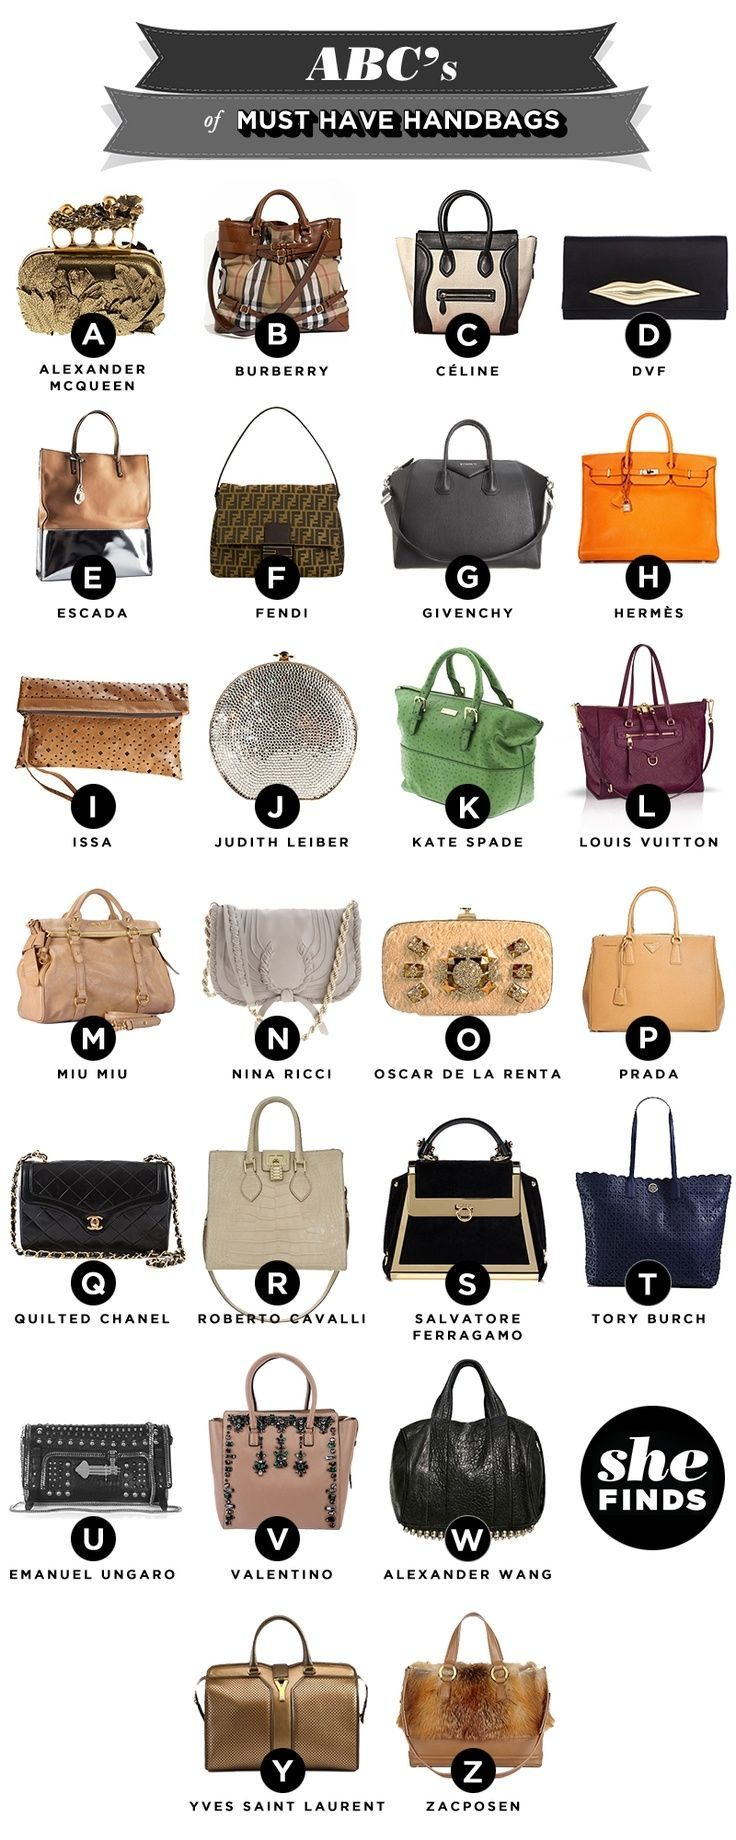 the must have handbags fashion sunglasses chanel designer louis vuitton high fashion gucci purses handbags burberry - vintage designer handbags, best handbags, black and brown handbags *sponsored https://www.pinterest.com/purses_handbags/ https://www.pinterest.com/explore/hand-bag/ https://www.pinterest.com/purses_handbags/clutch-purse/ https://www.stylewe.com/category/handbags-237